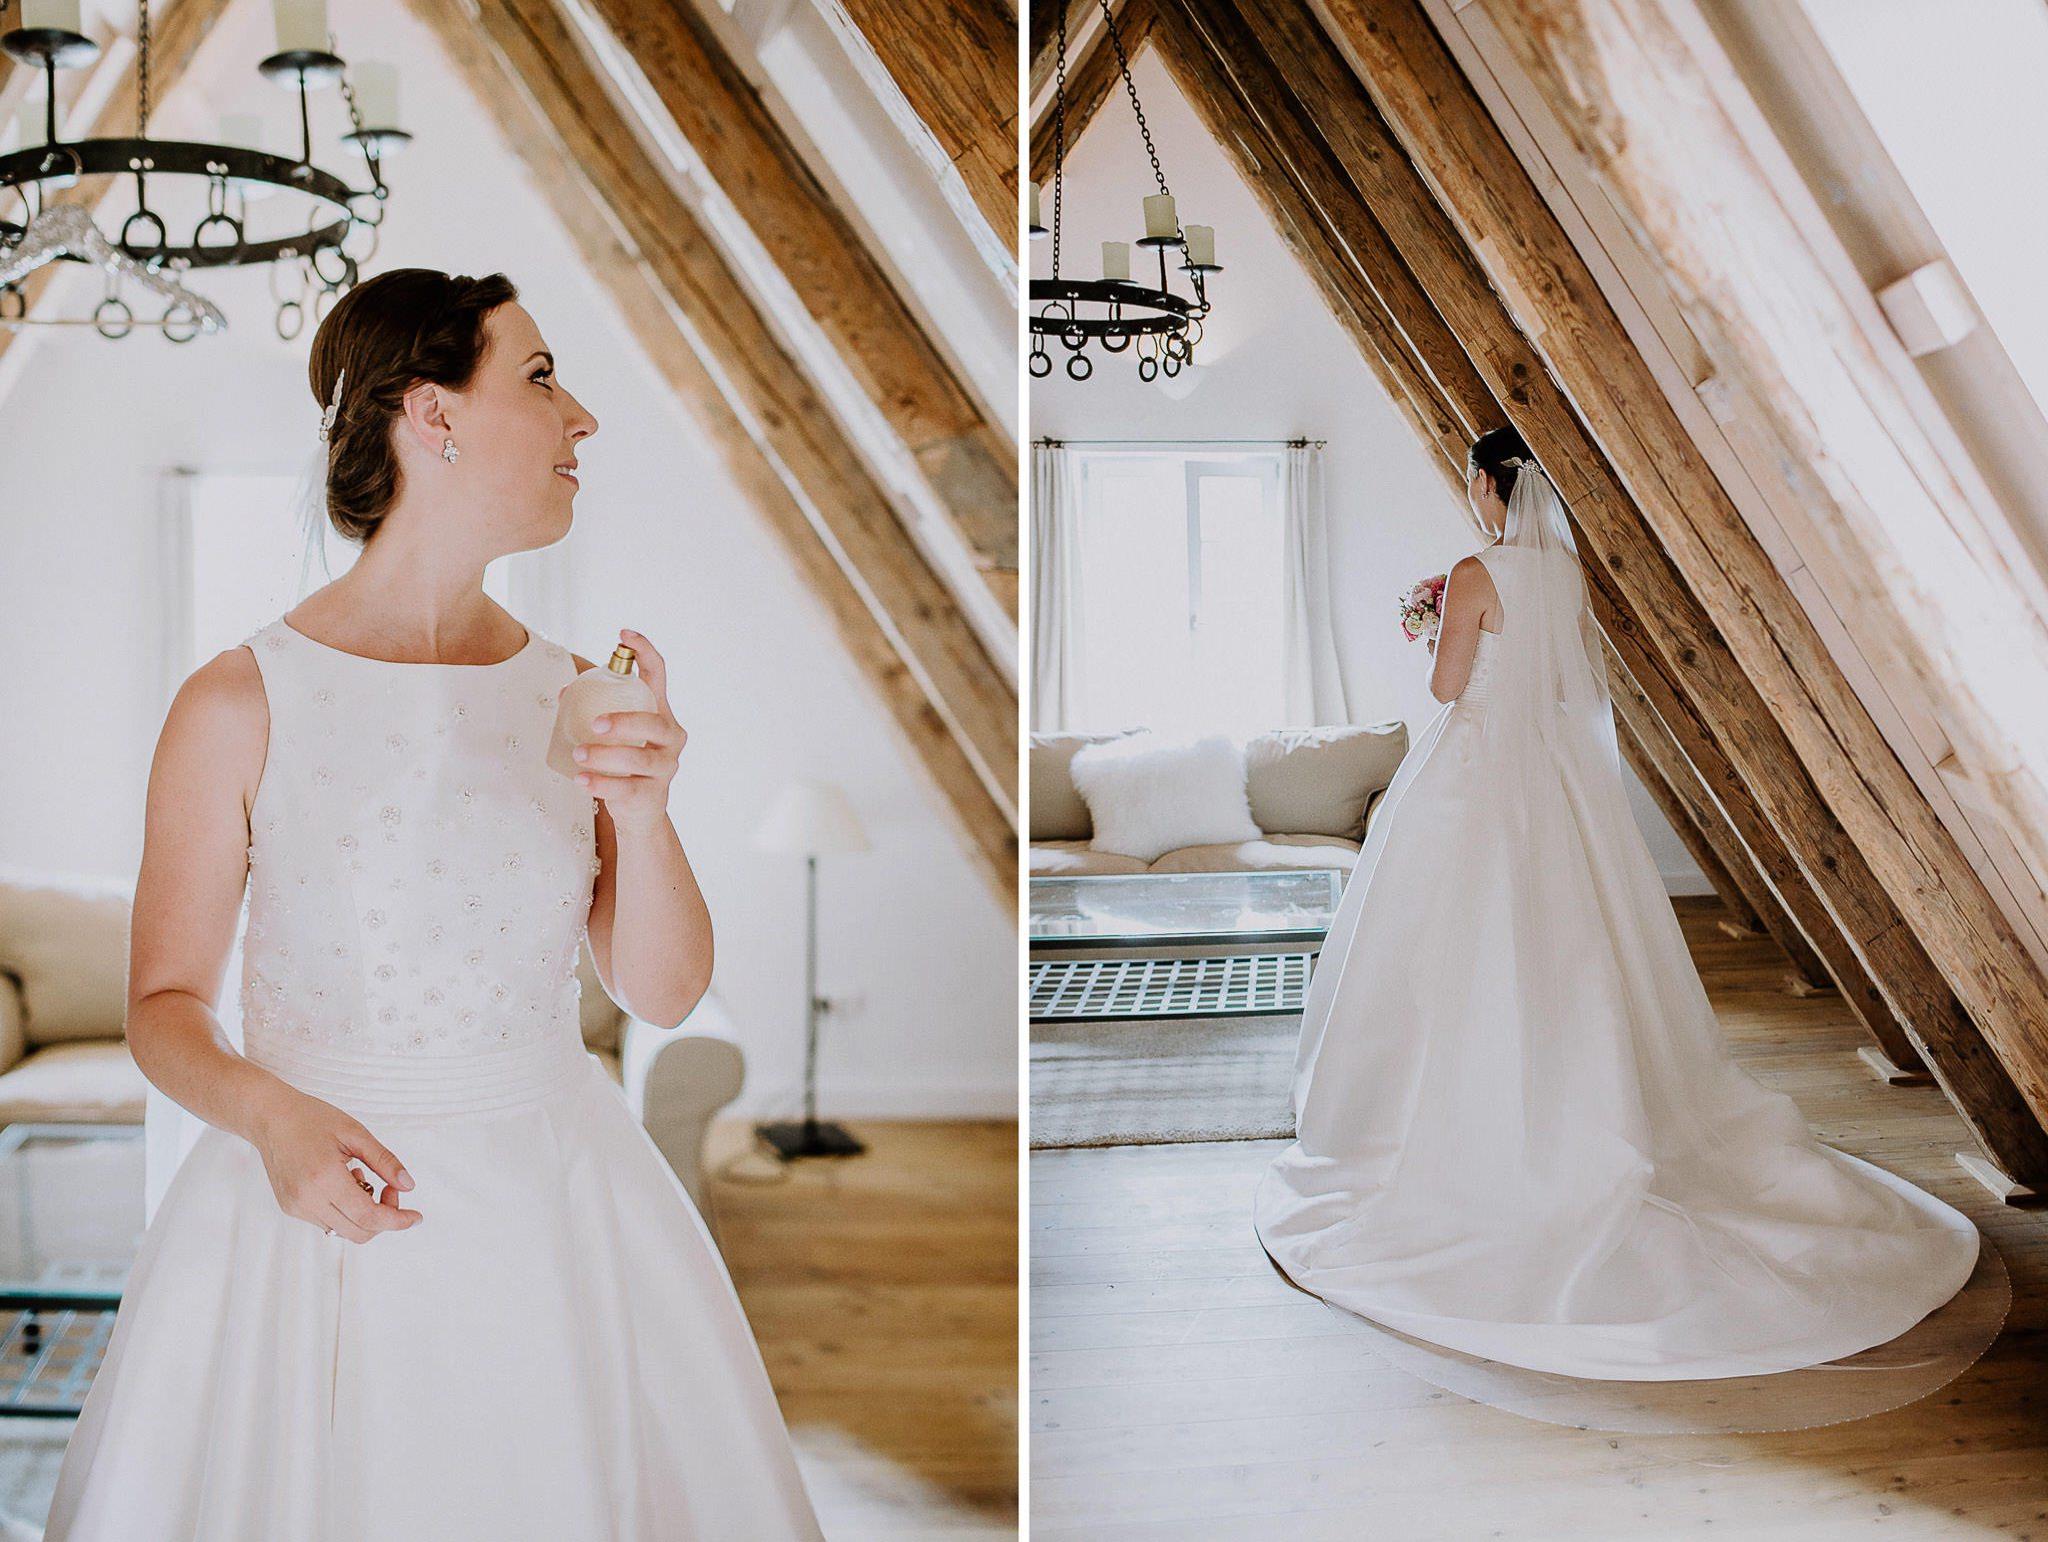 wedding photographer hamilton new zealand 1006 5